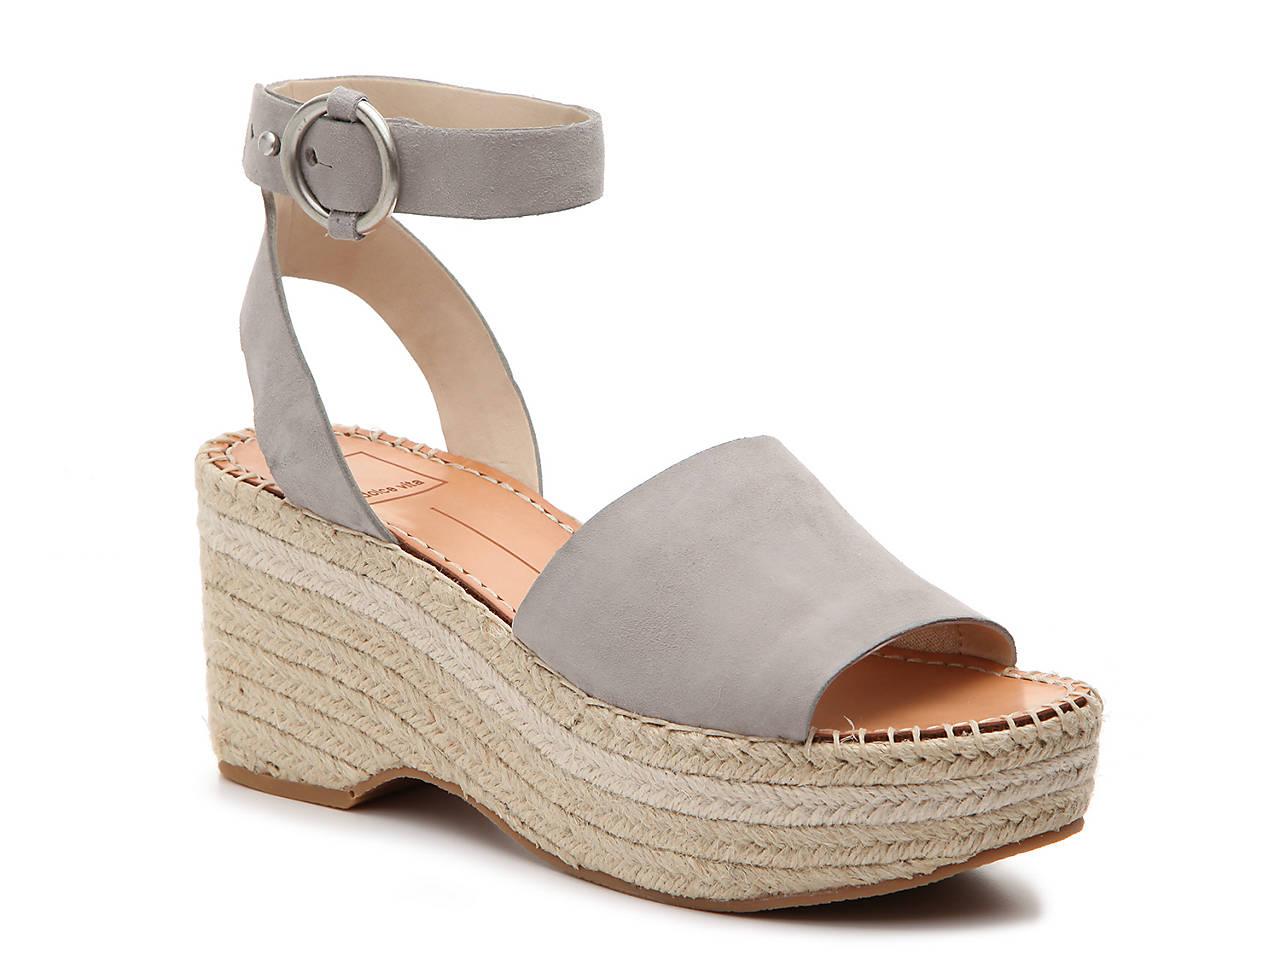 51c25ab9b1 Dolce Vita Lesly Espadrille Wedge Sandal Women's Shoes | DSW